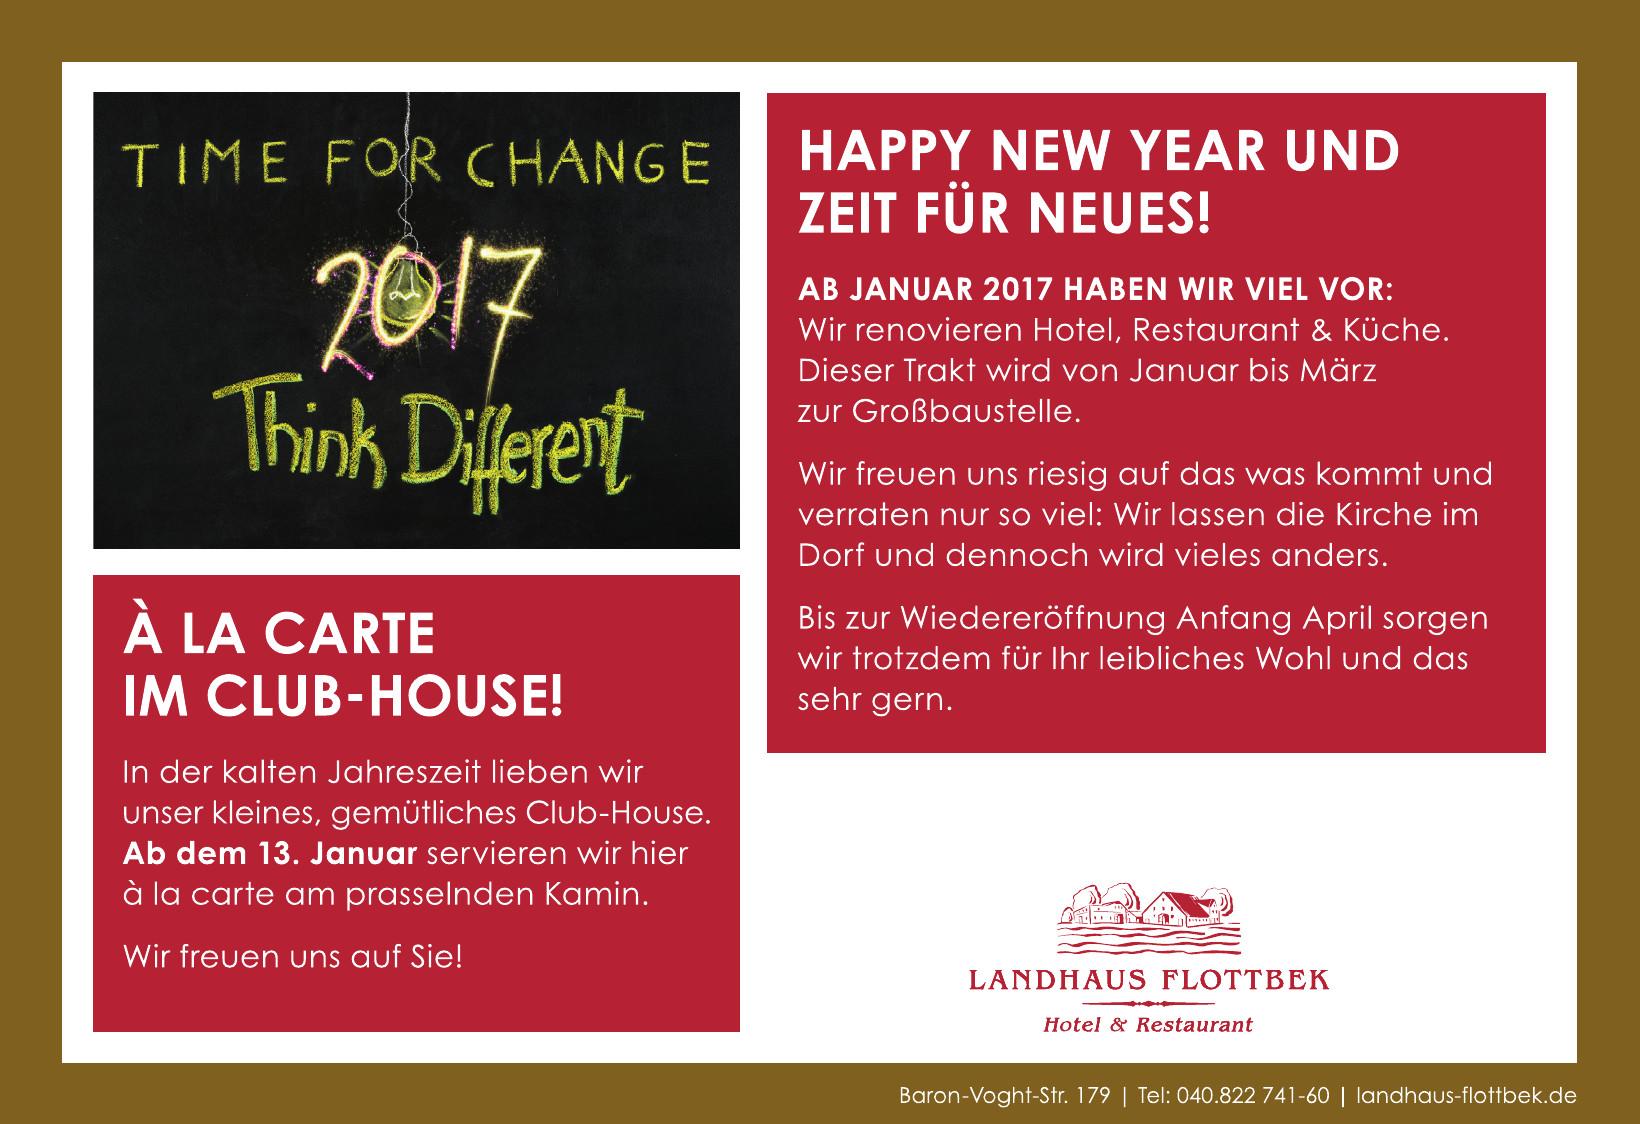 Landhaus Flottbek Hotel & Restaurant